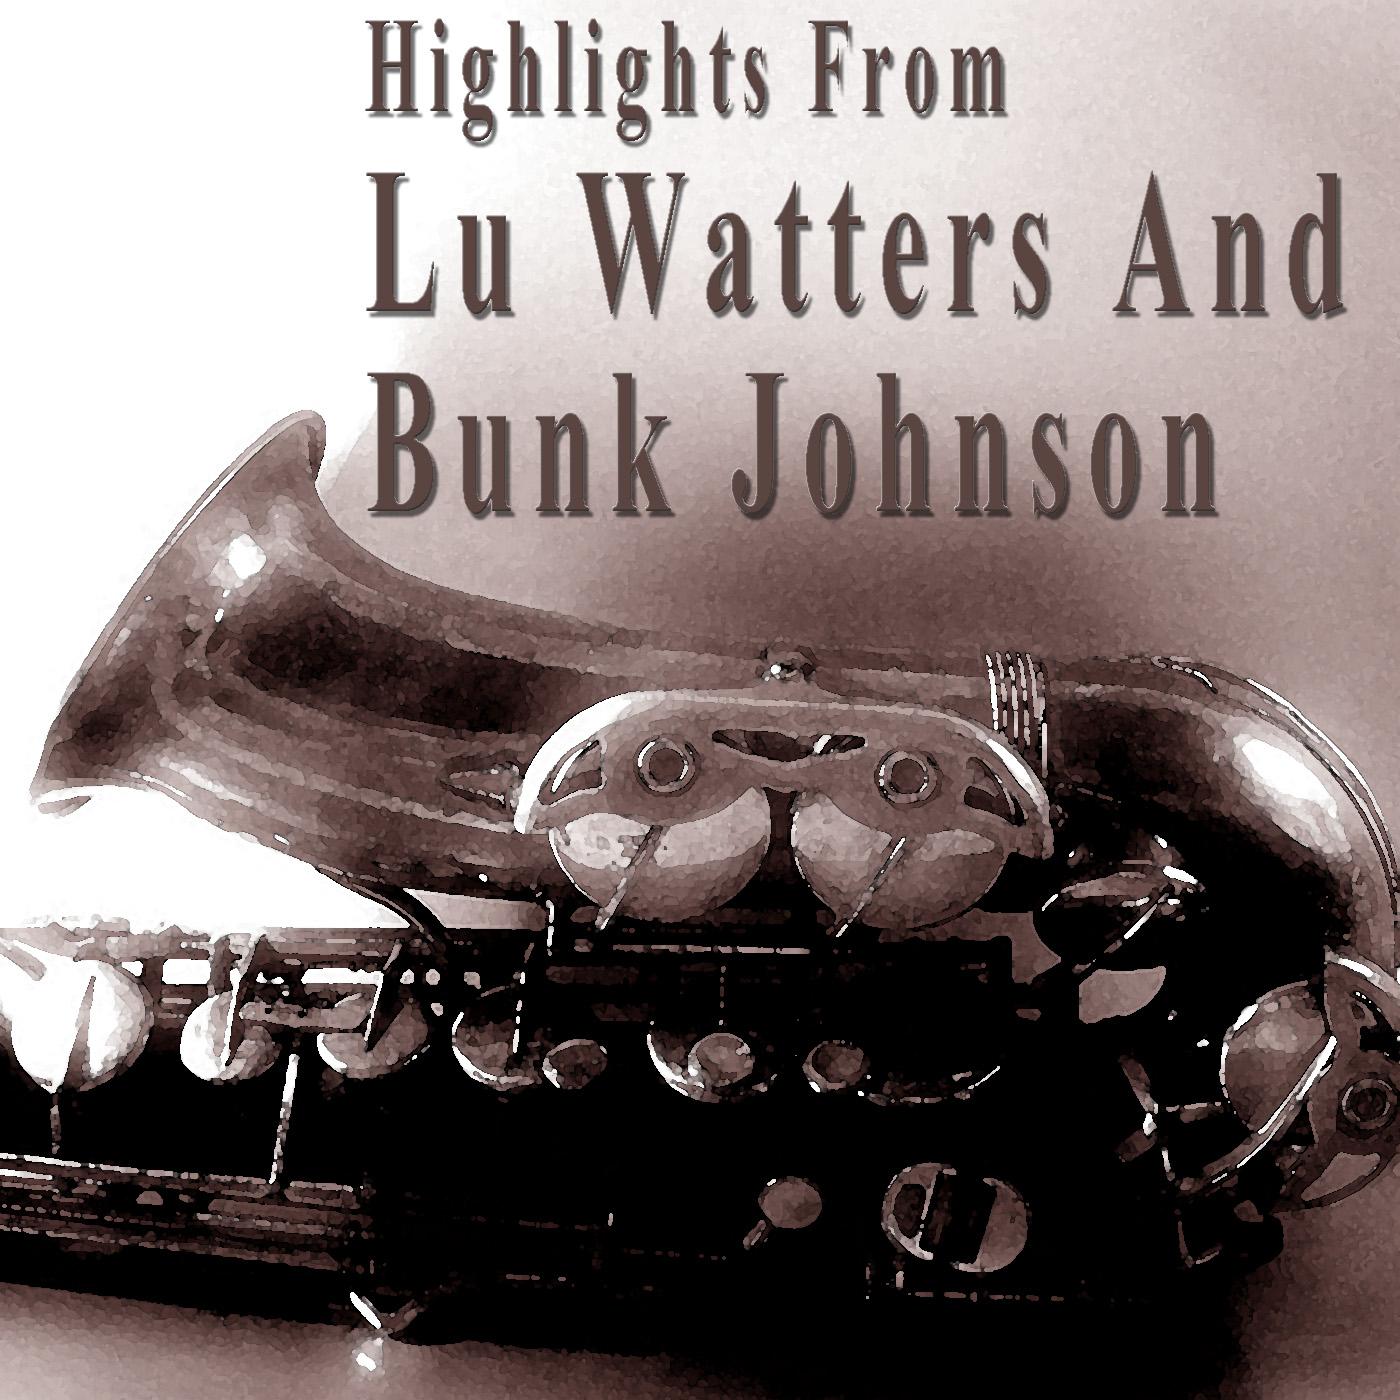 Lu Watters and Bunk Johnson